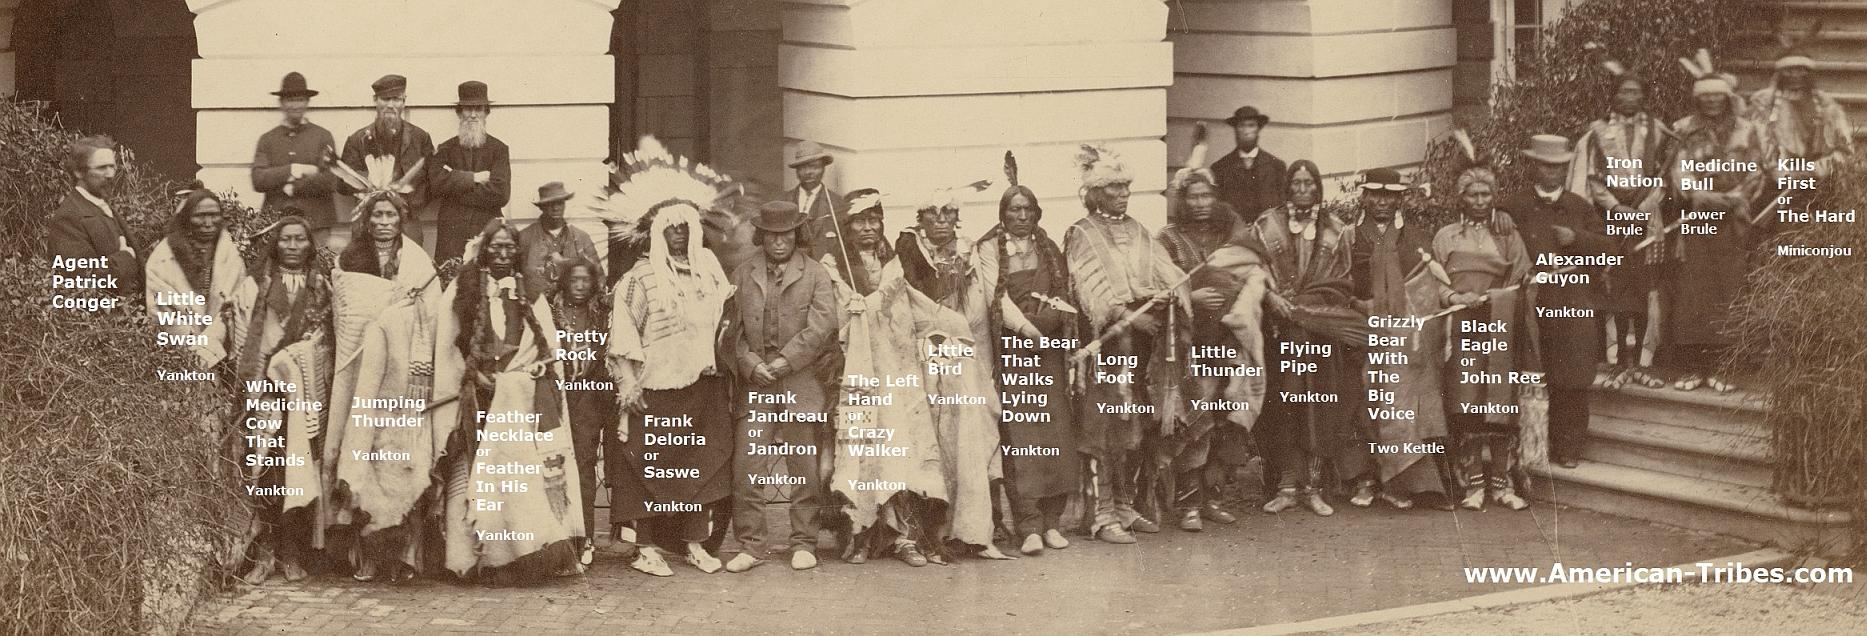 http://www.american-tribes.com/messageboards/dietmar/delegation1867ID2.jpg